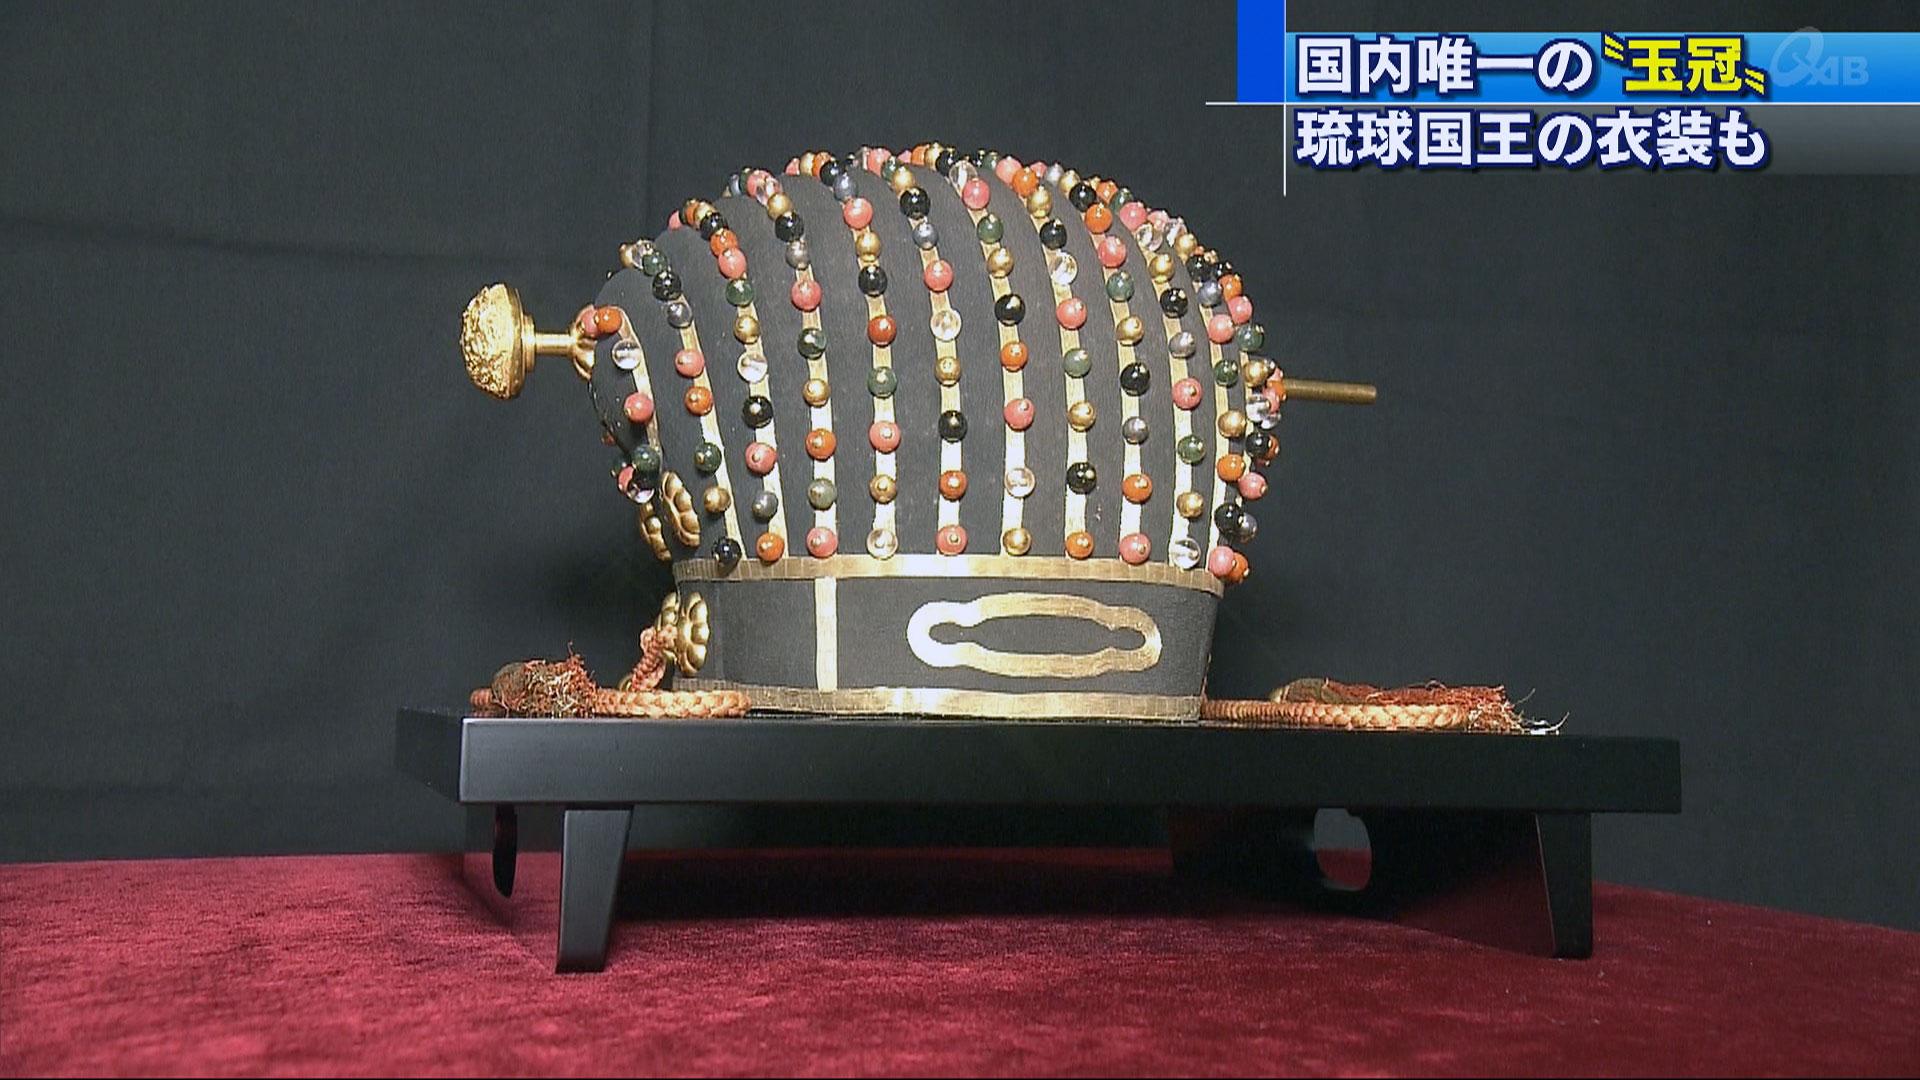 世界で唯一の琉球国王冠公開